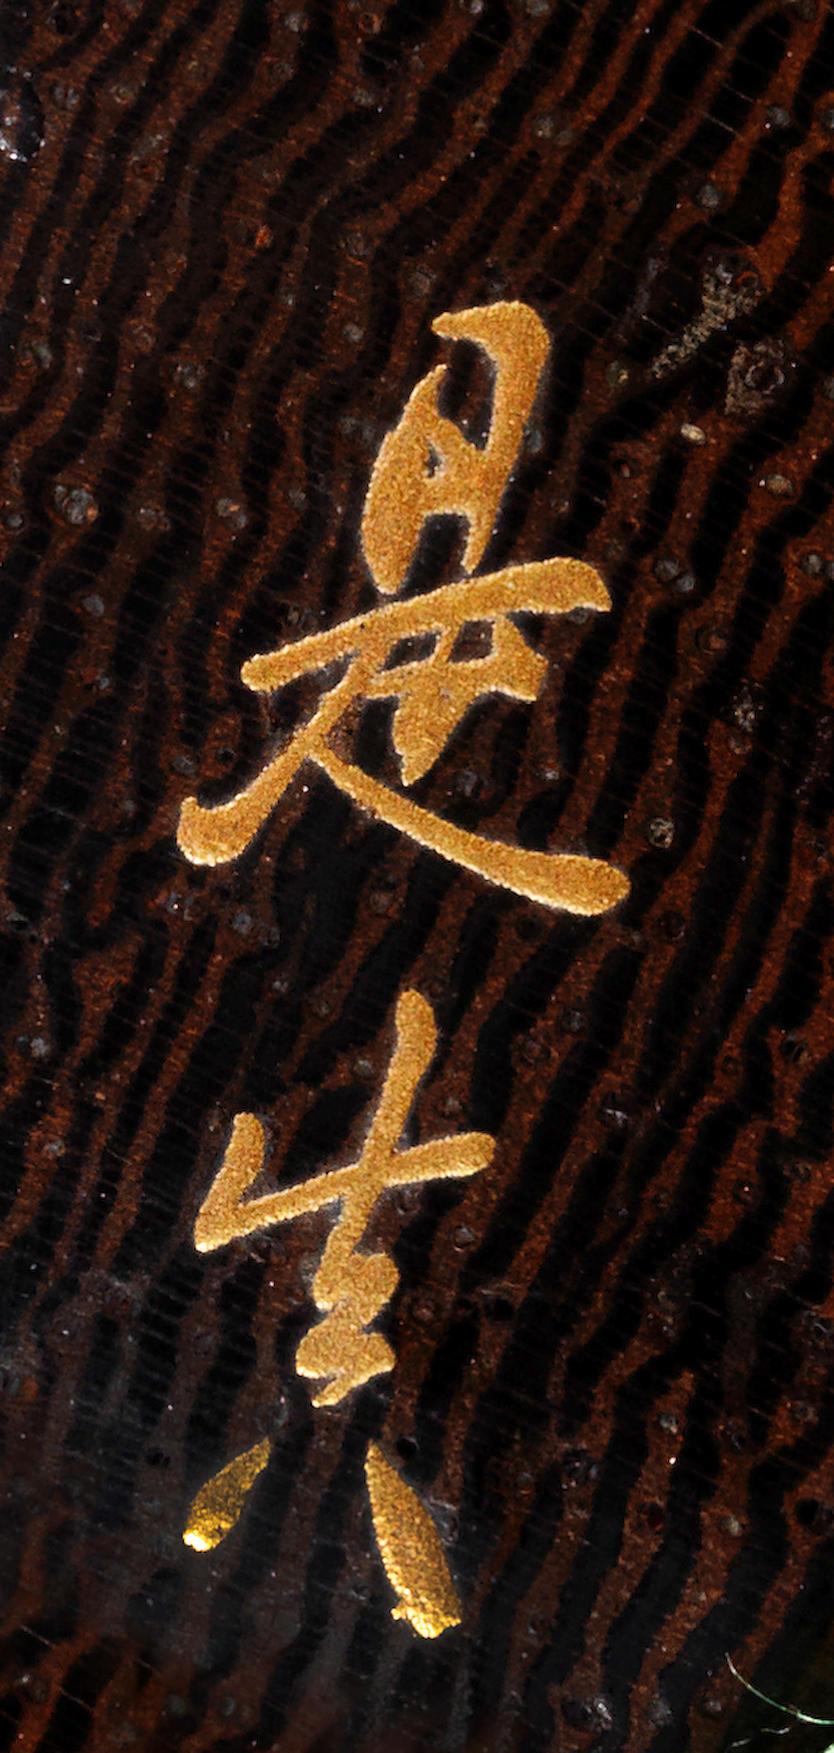 Shibata Zeshin 柴田是真 (1807–1891)  INRŌ WITH MOUSE  二十日鼠図蒔絵印籠  Meiji era (1868–1912), circa 1870–1890